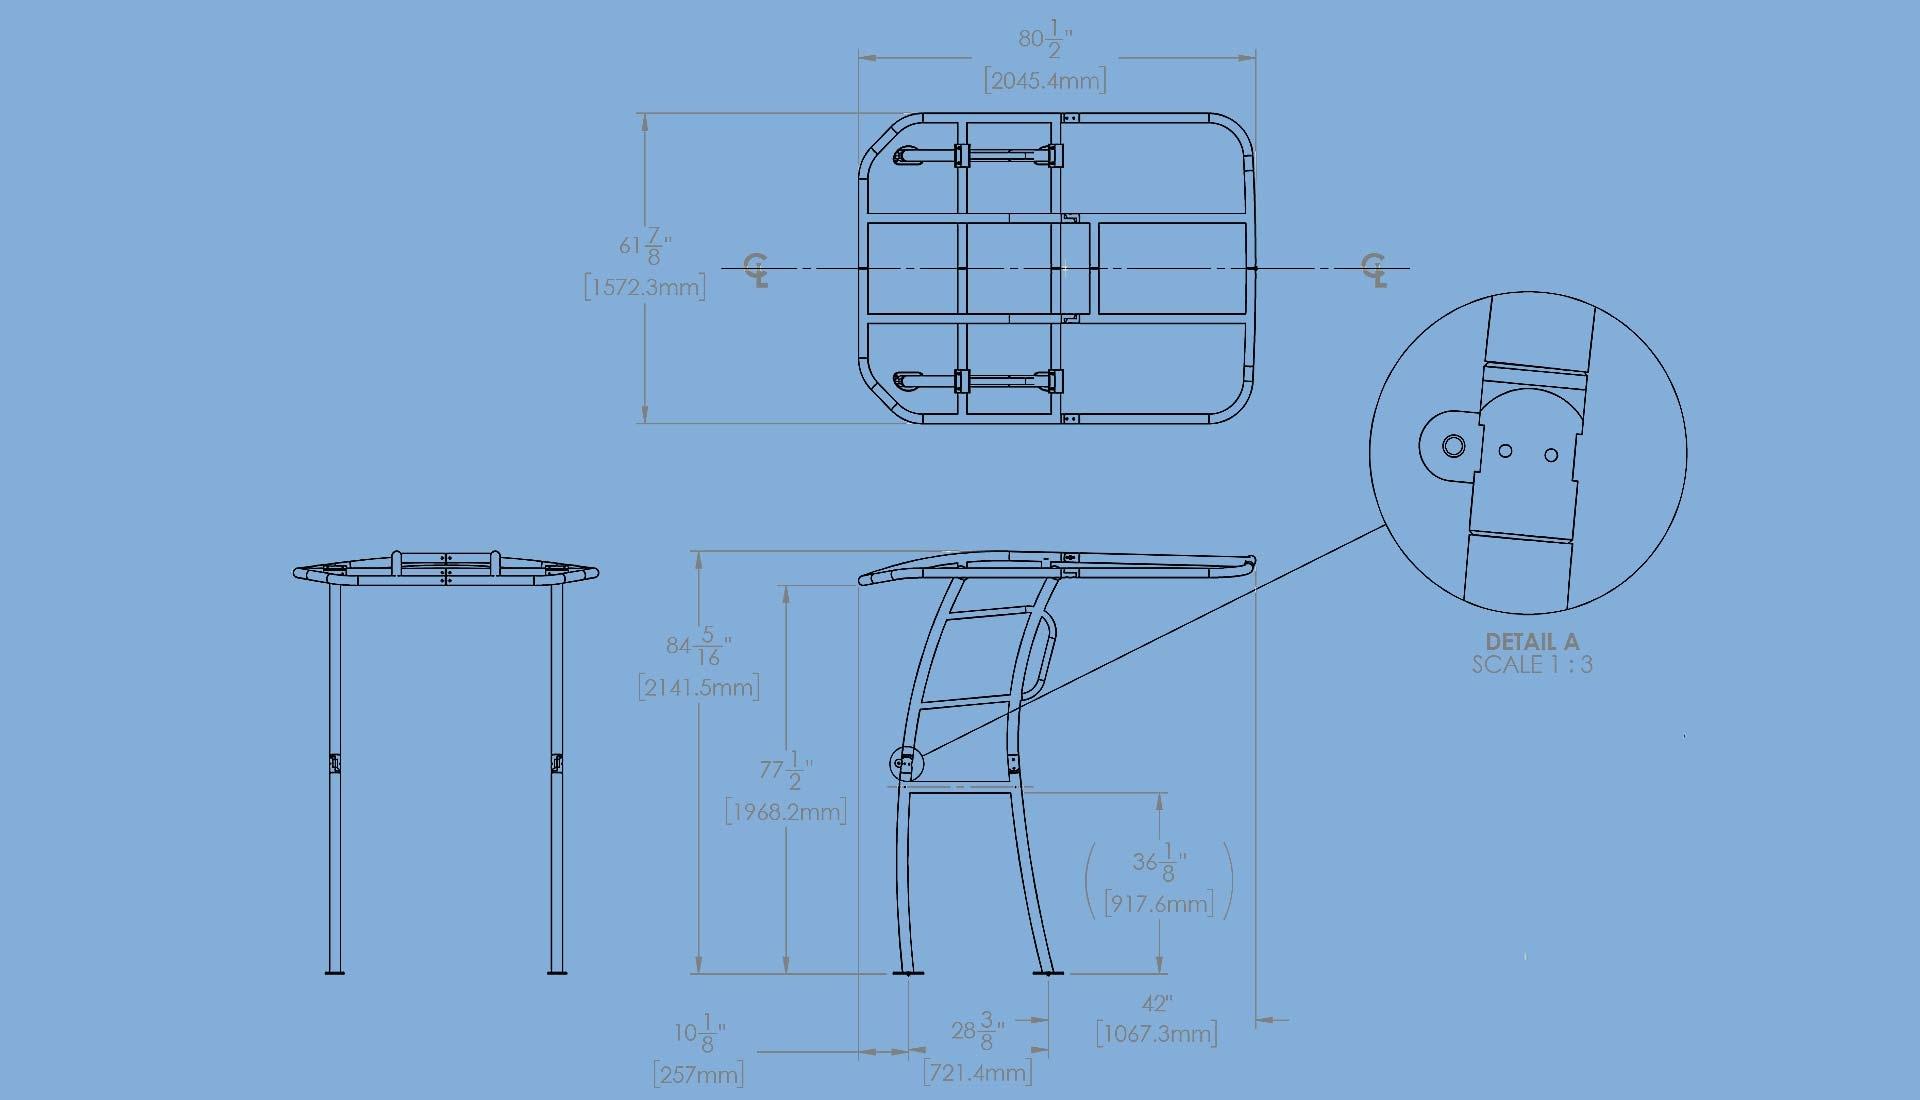 pro series t-top measurements